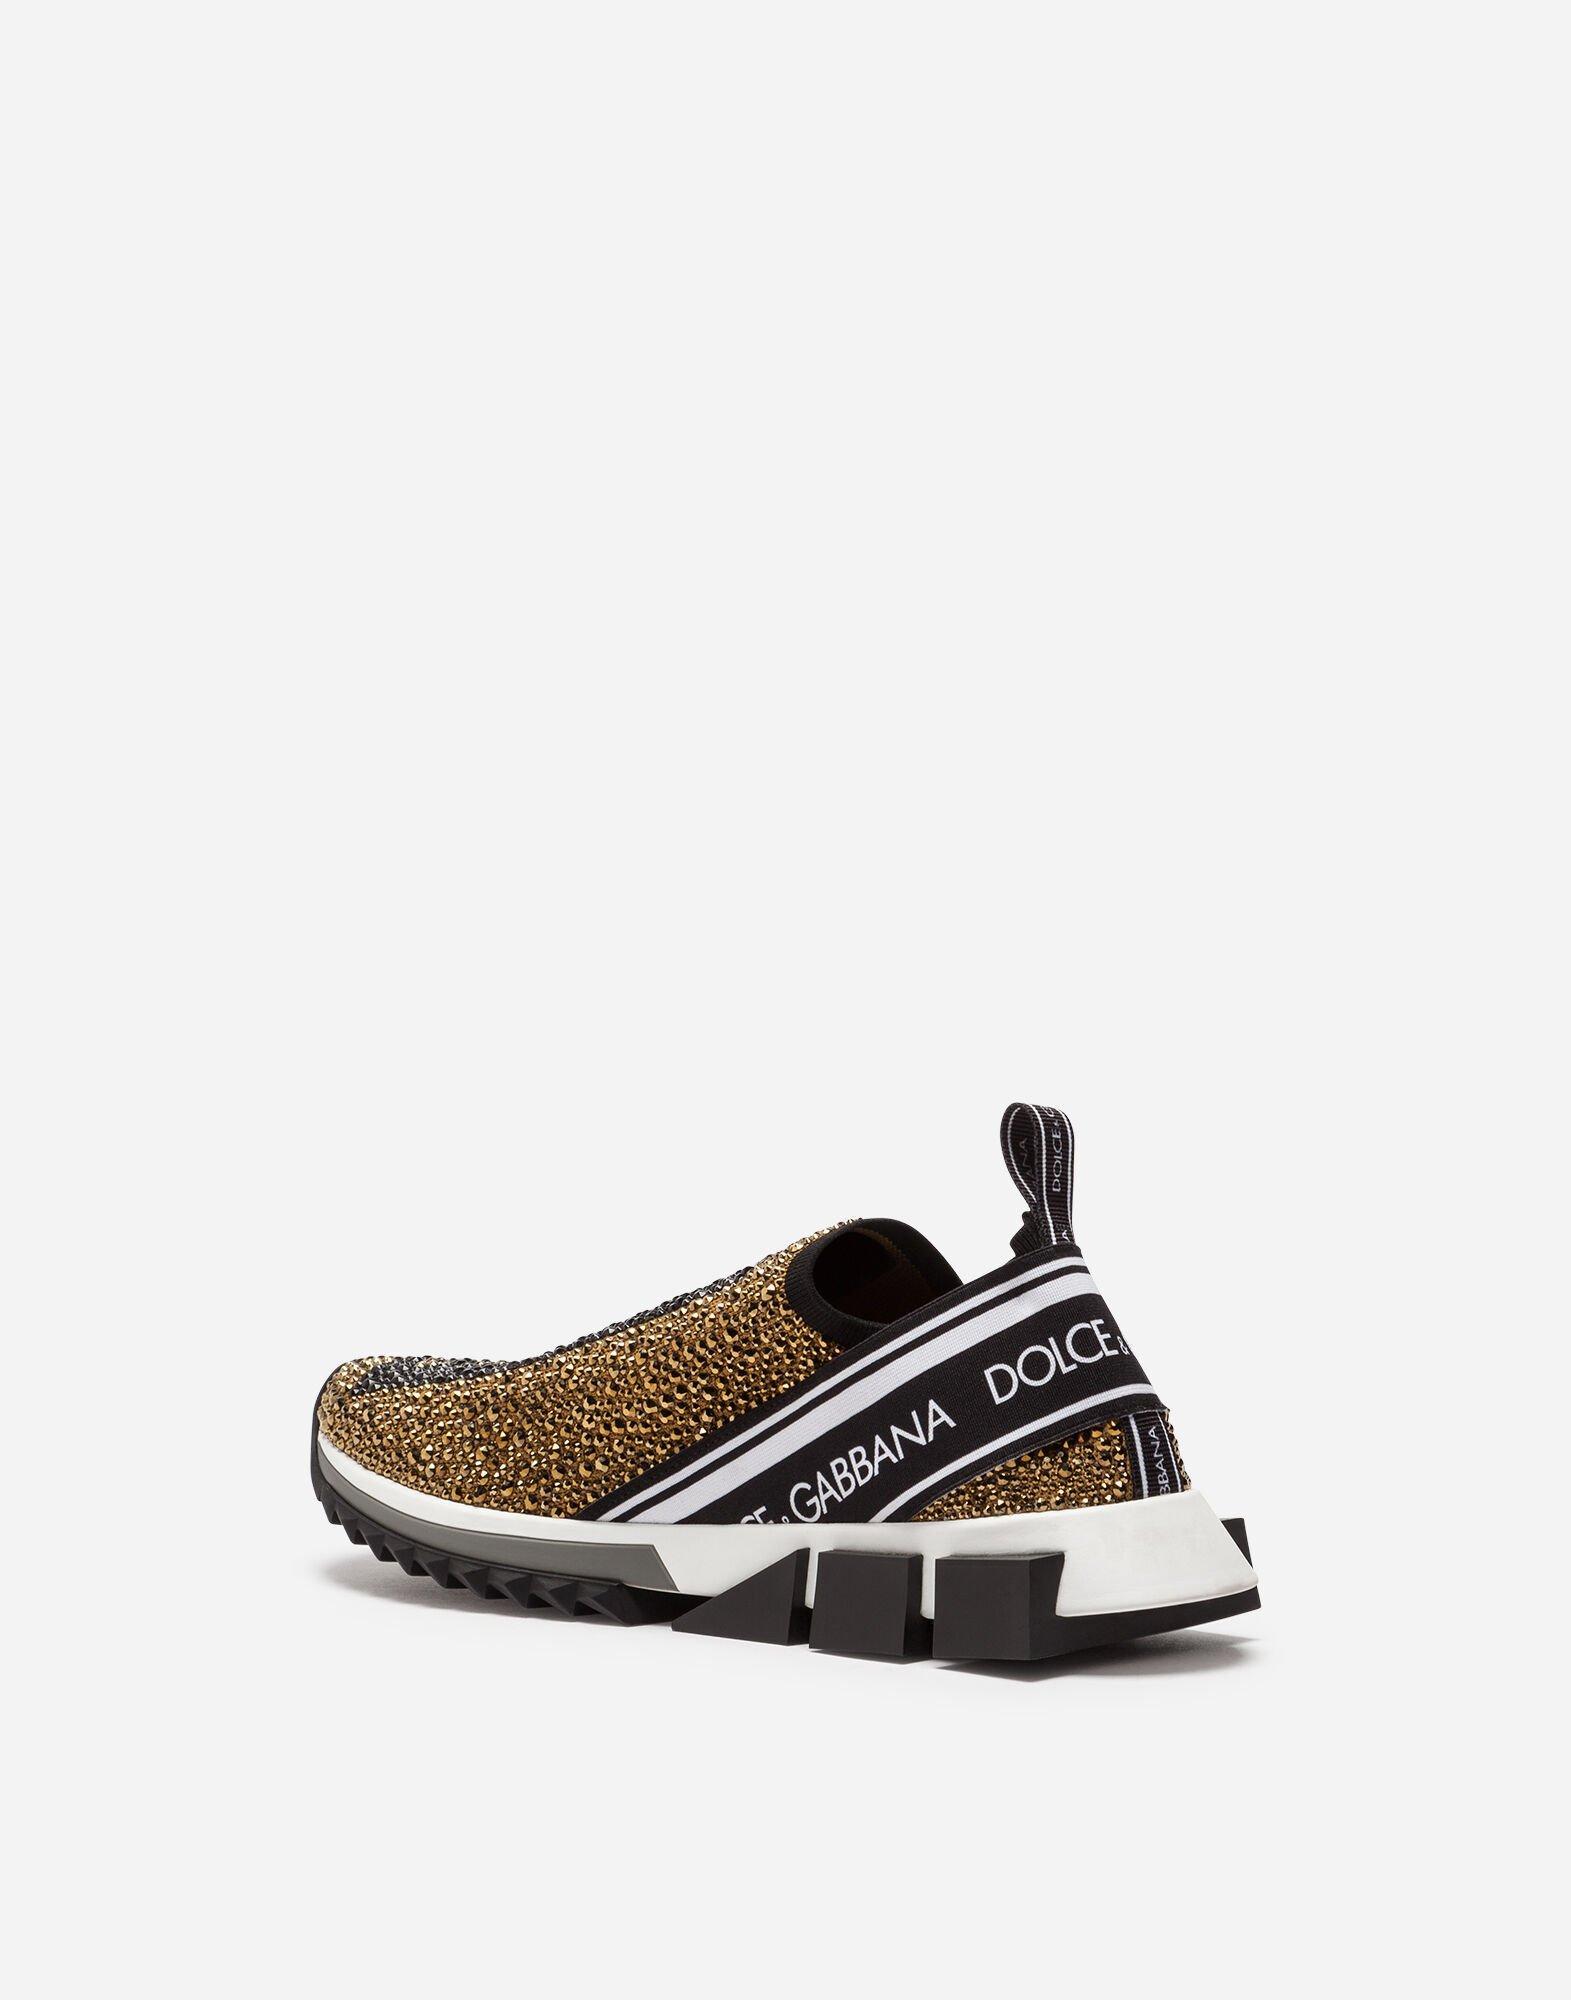 Zapatillas Sorrento Con Cristales Termostrass Dolce & Gabbana de Tejido sintético de hombre